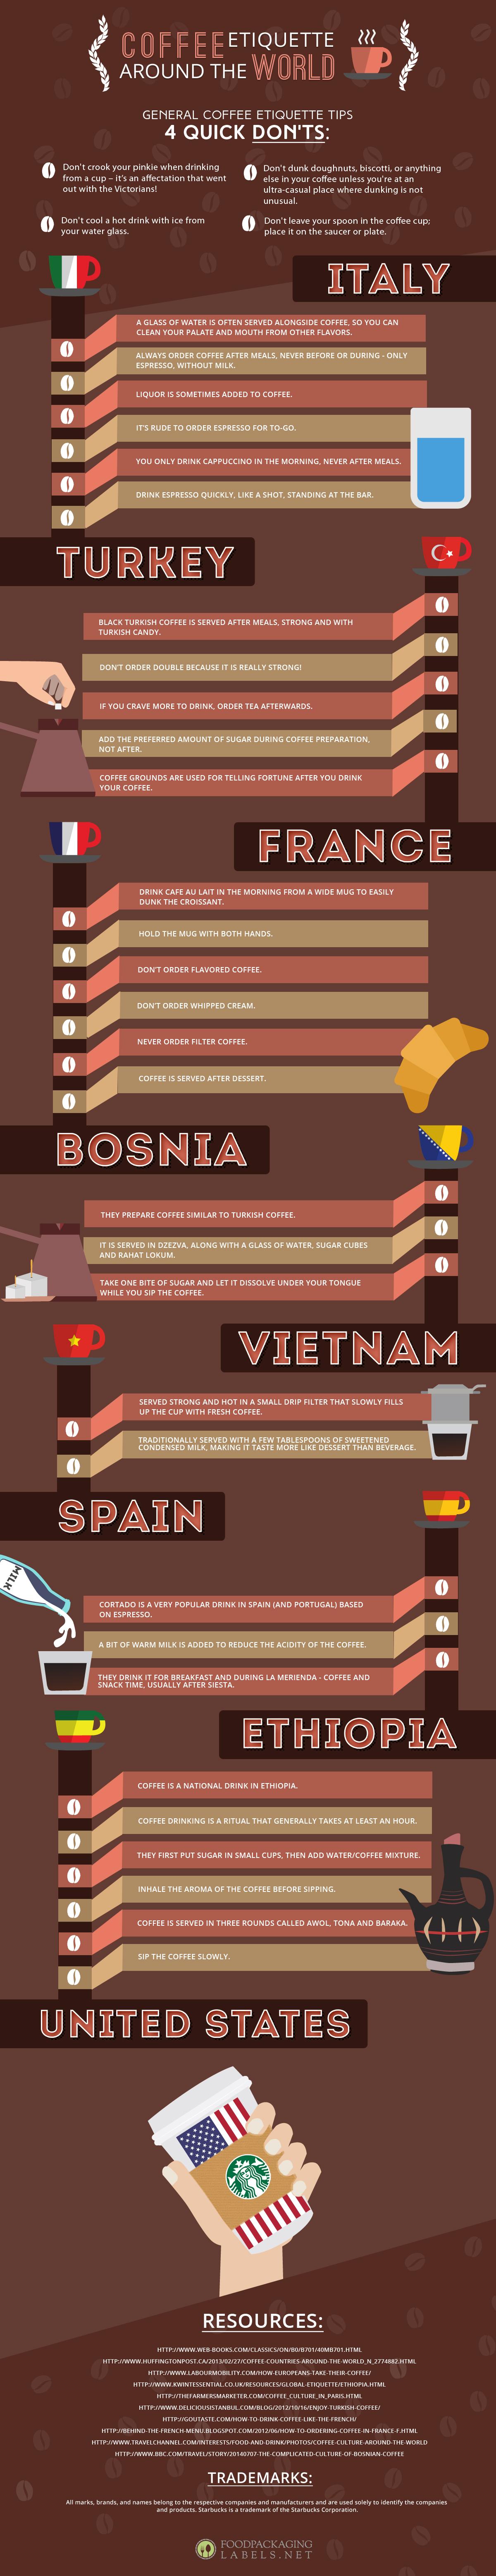 Coffee Etiquette Around the World